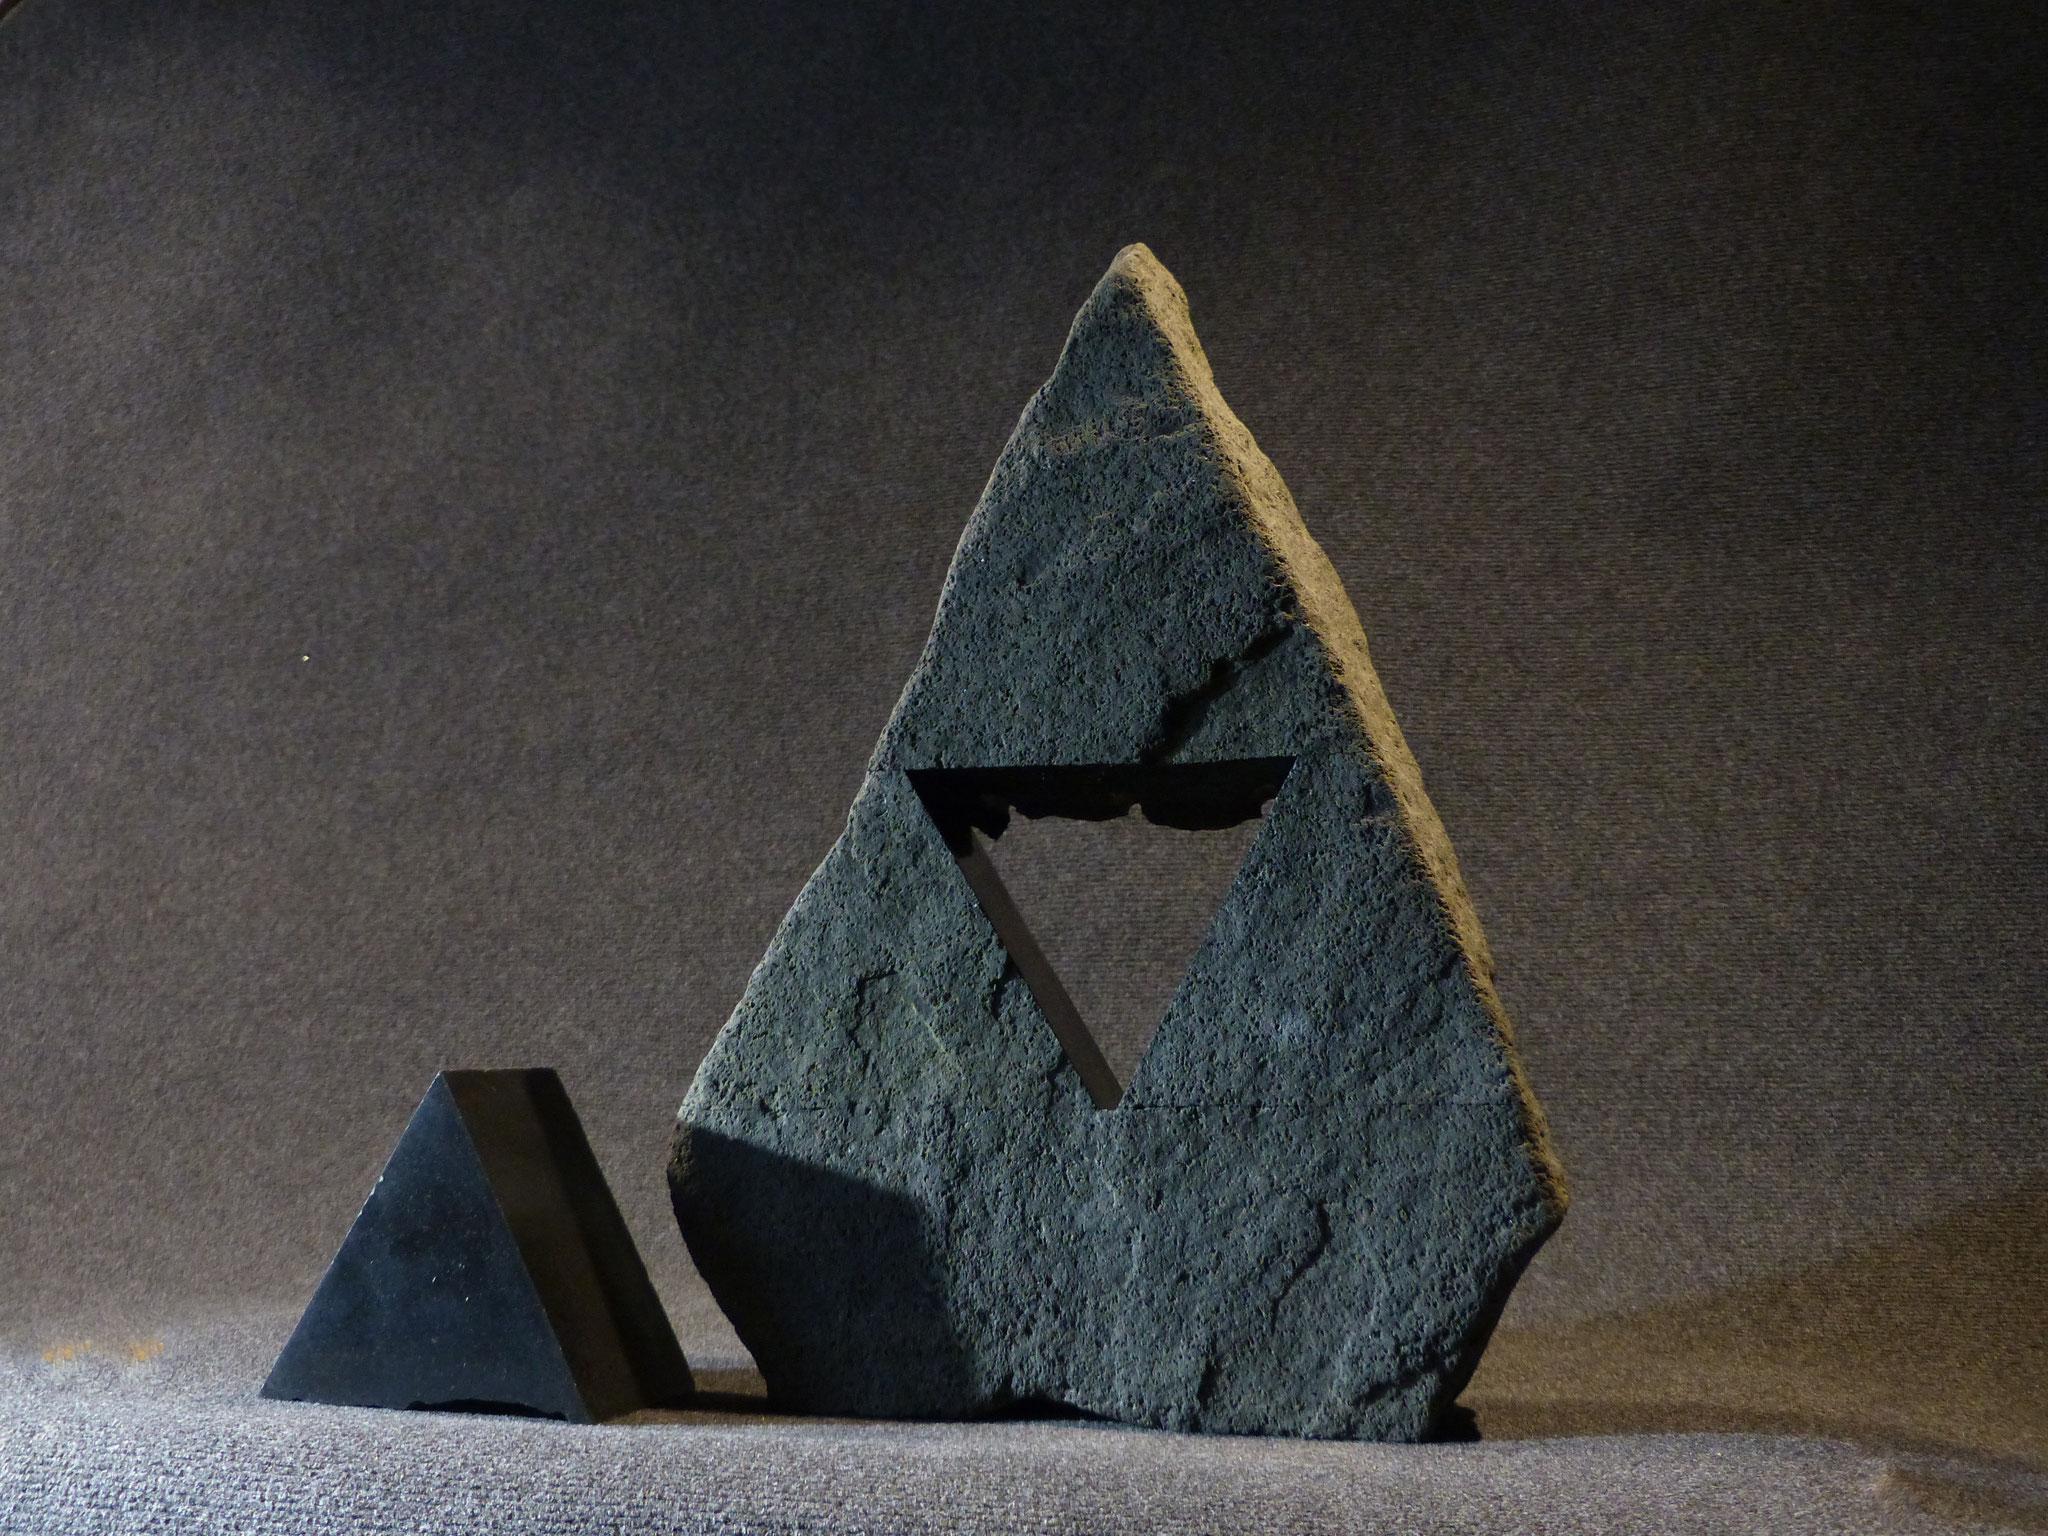 Erratique, l'errance - diorite - 50x36x12 cm